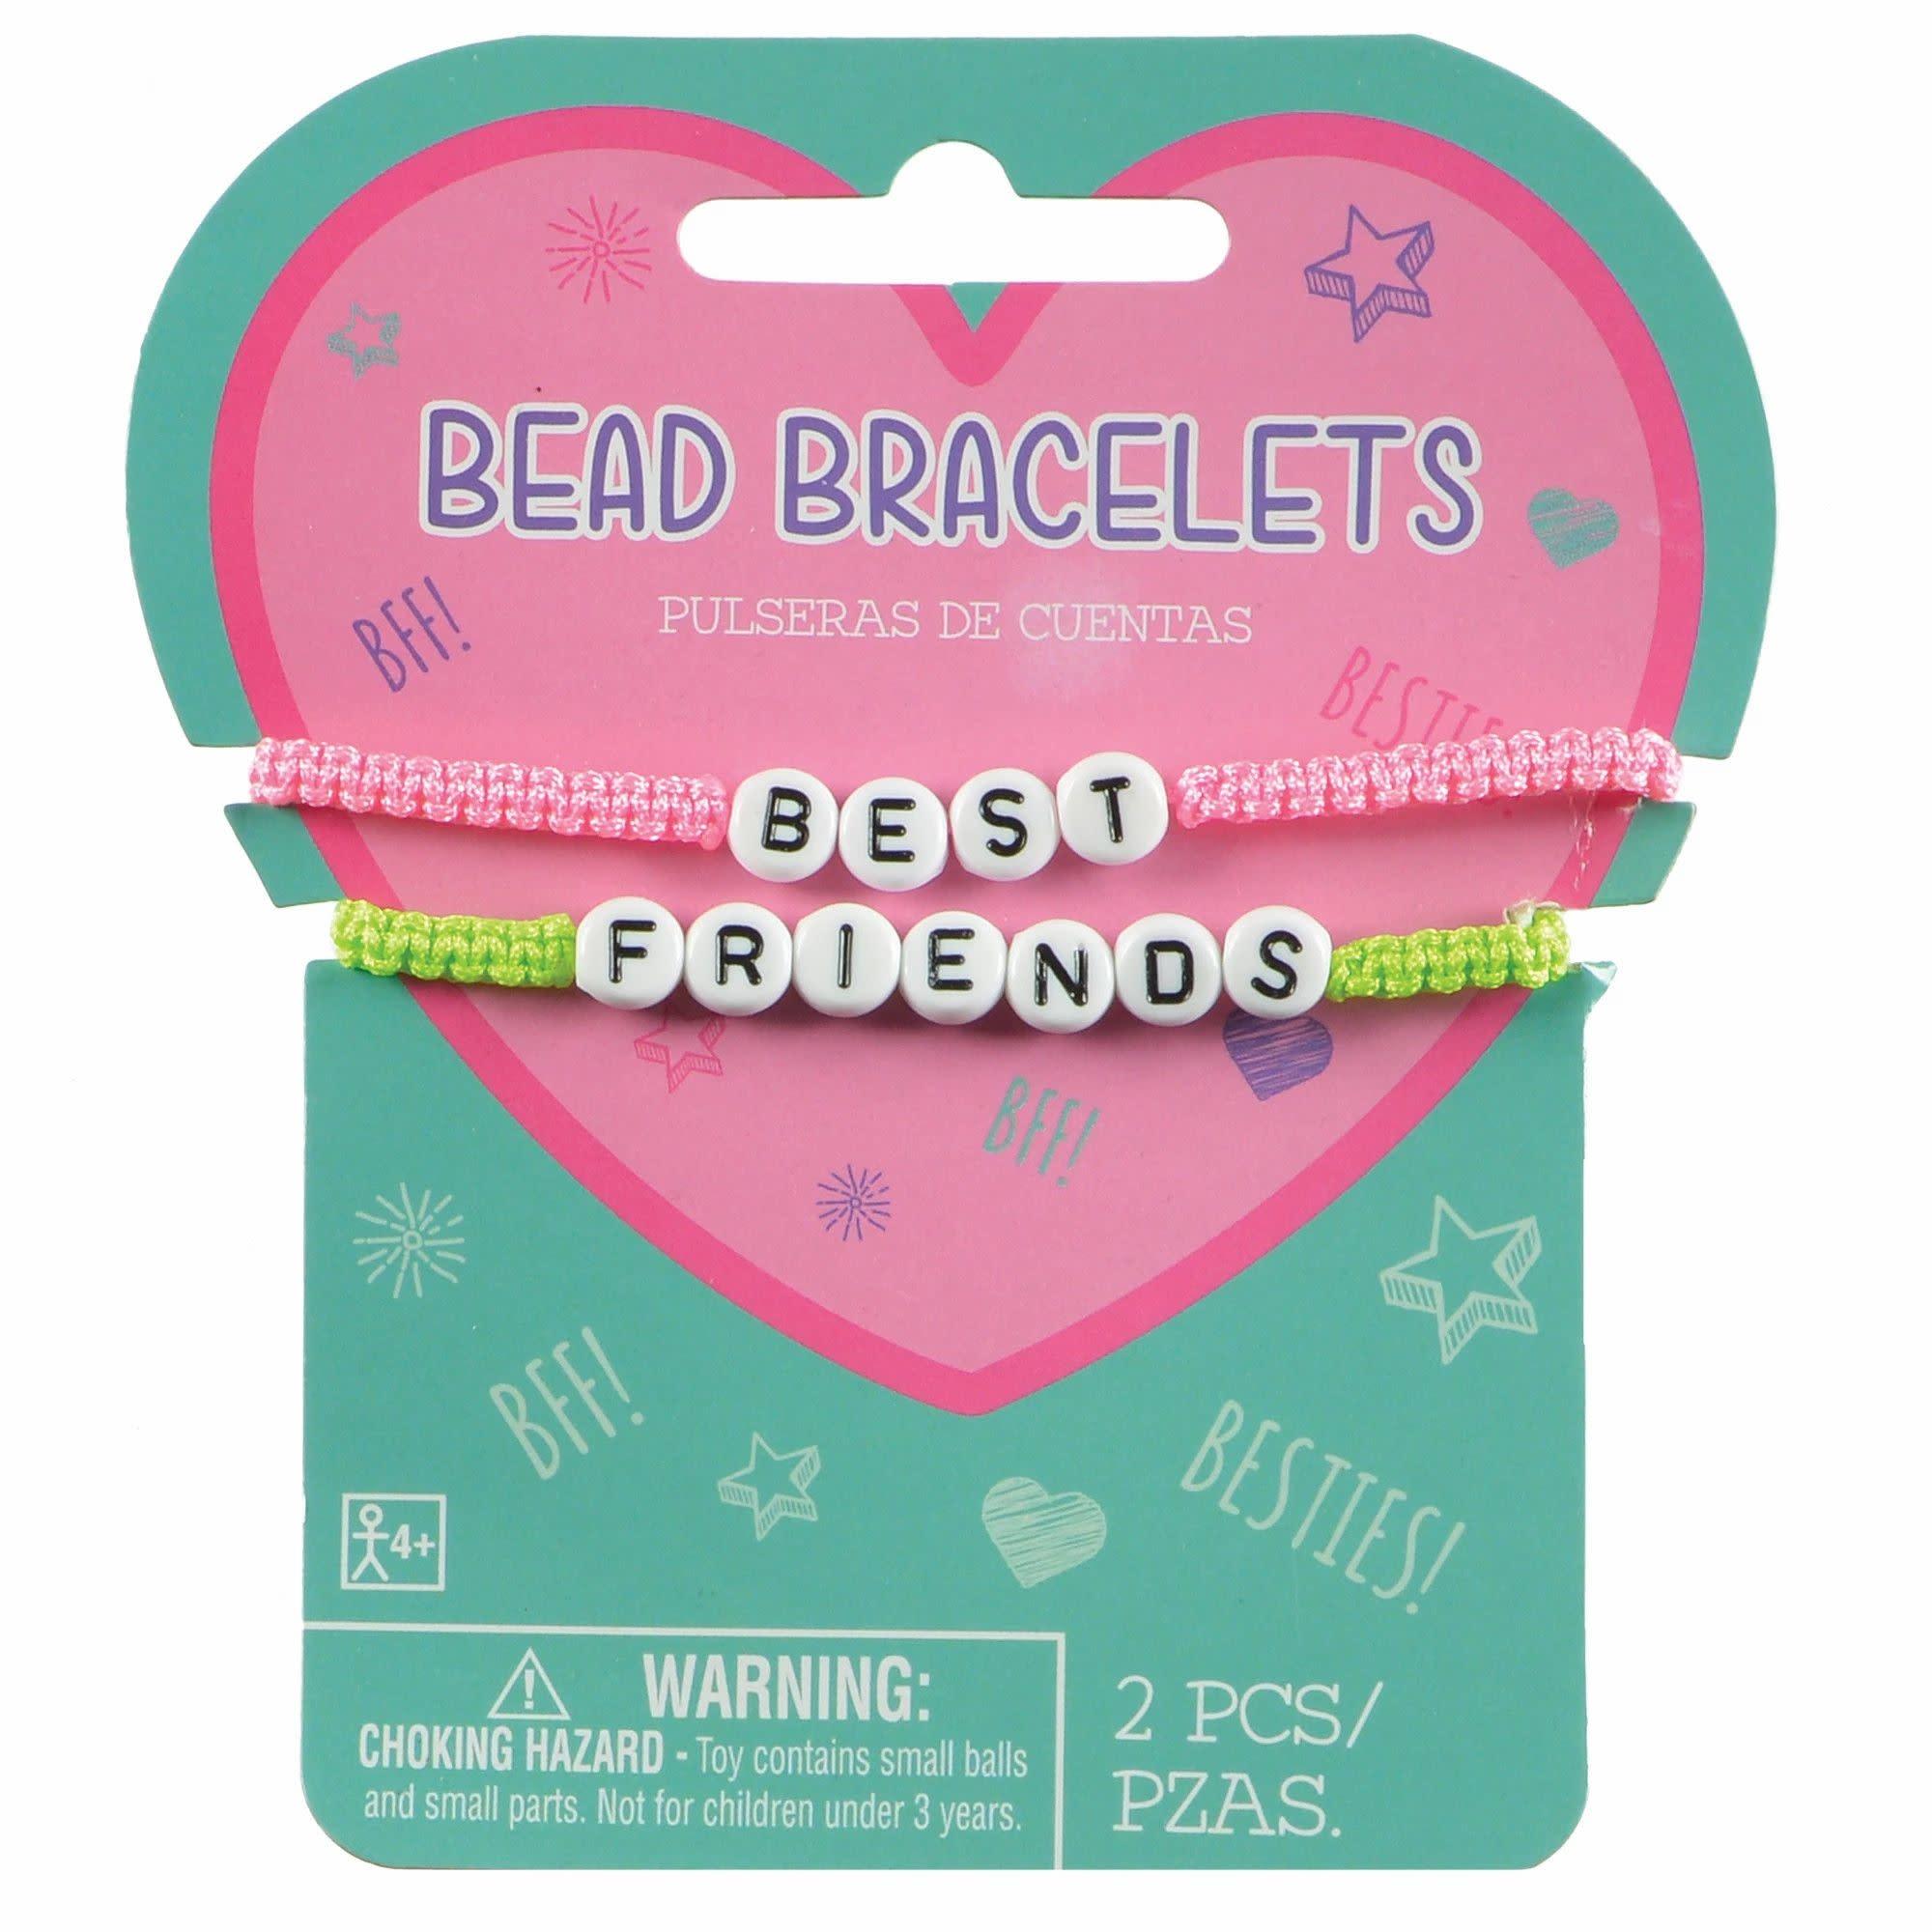 BFF Bead Bracelets